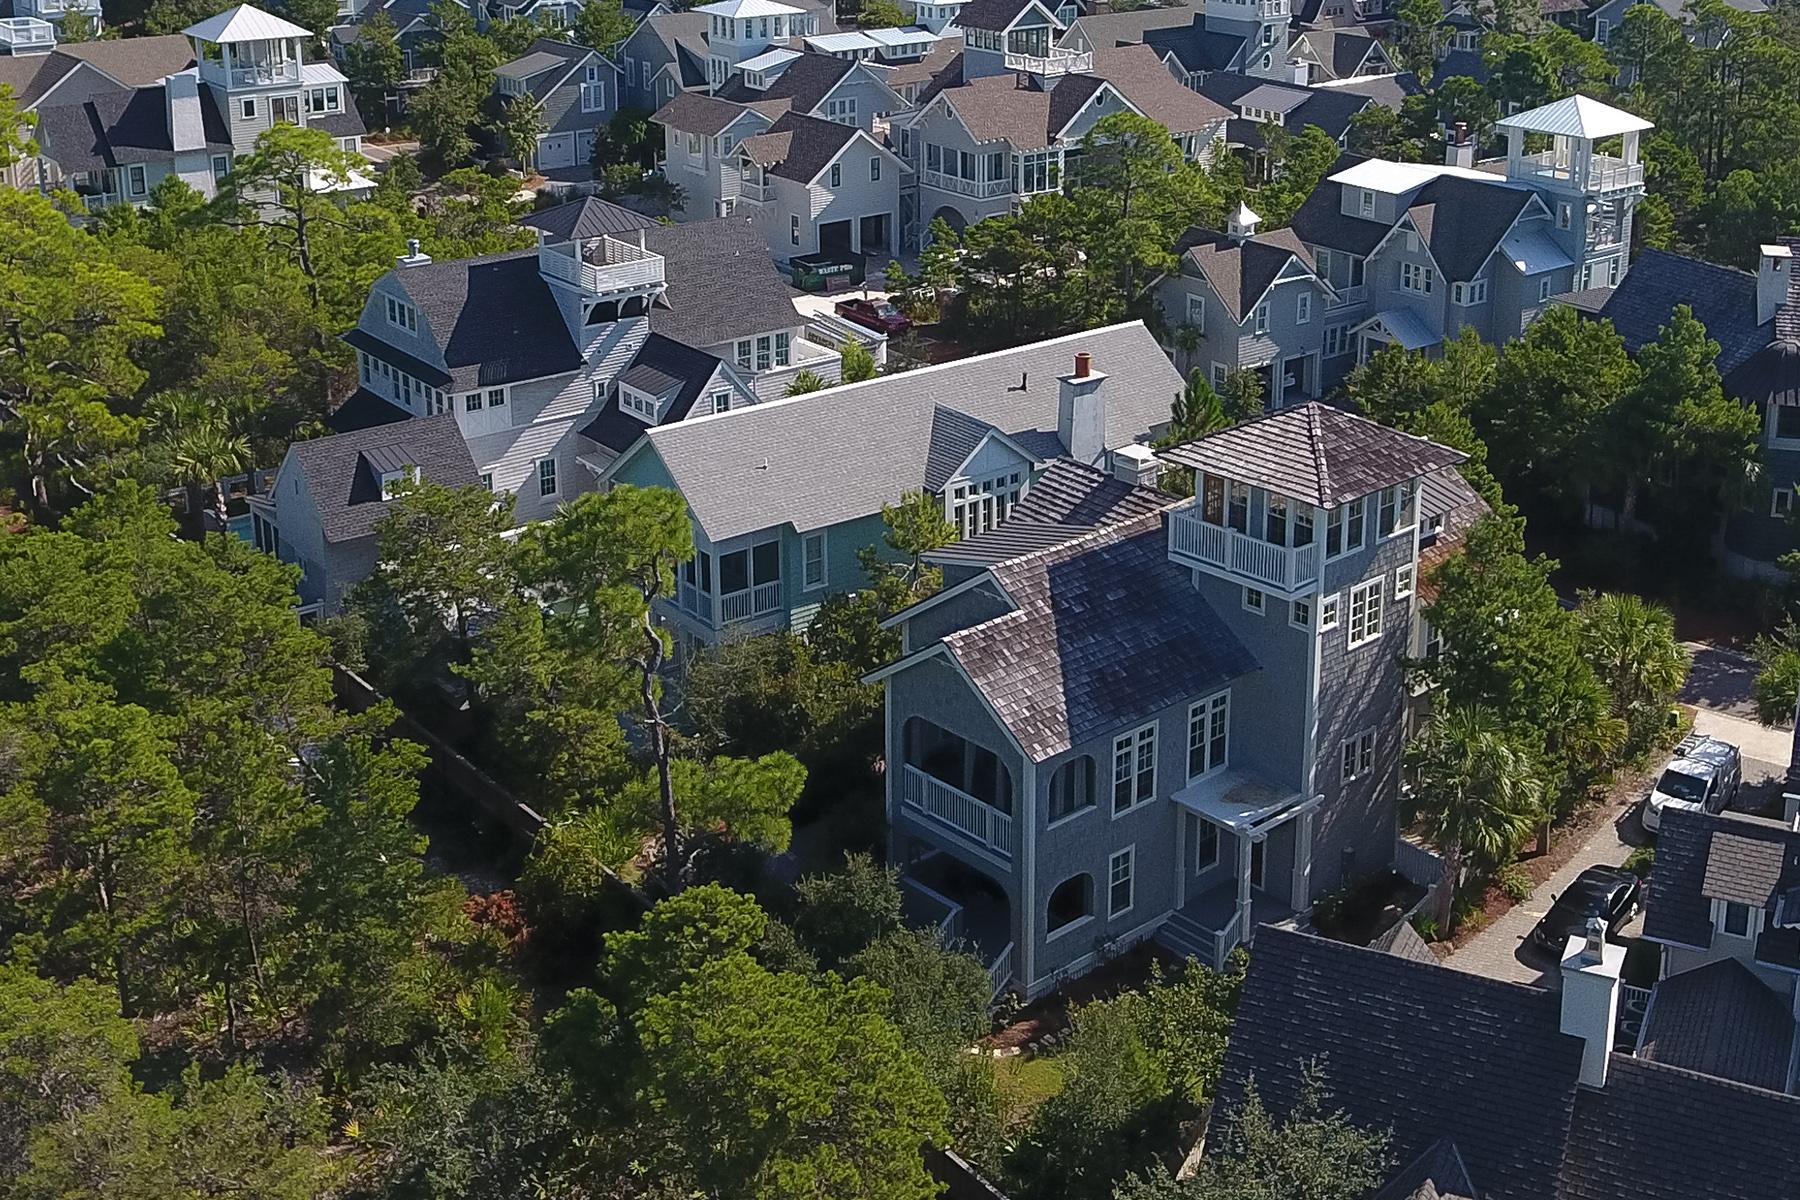 獨棟家庭住宅 為 出售 在 BEAUTIFULLY DECORATED BORDERING TRANQUIL STATE PAR 148 Coopersmith Lane Watersound, Watersound, 佛羅里達州, 32461 美國